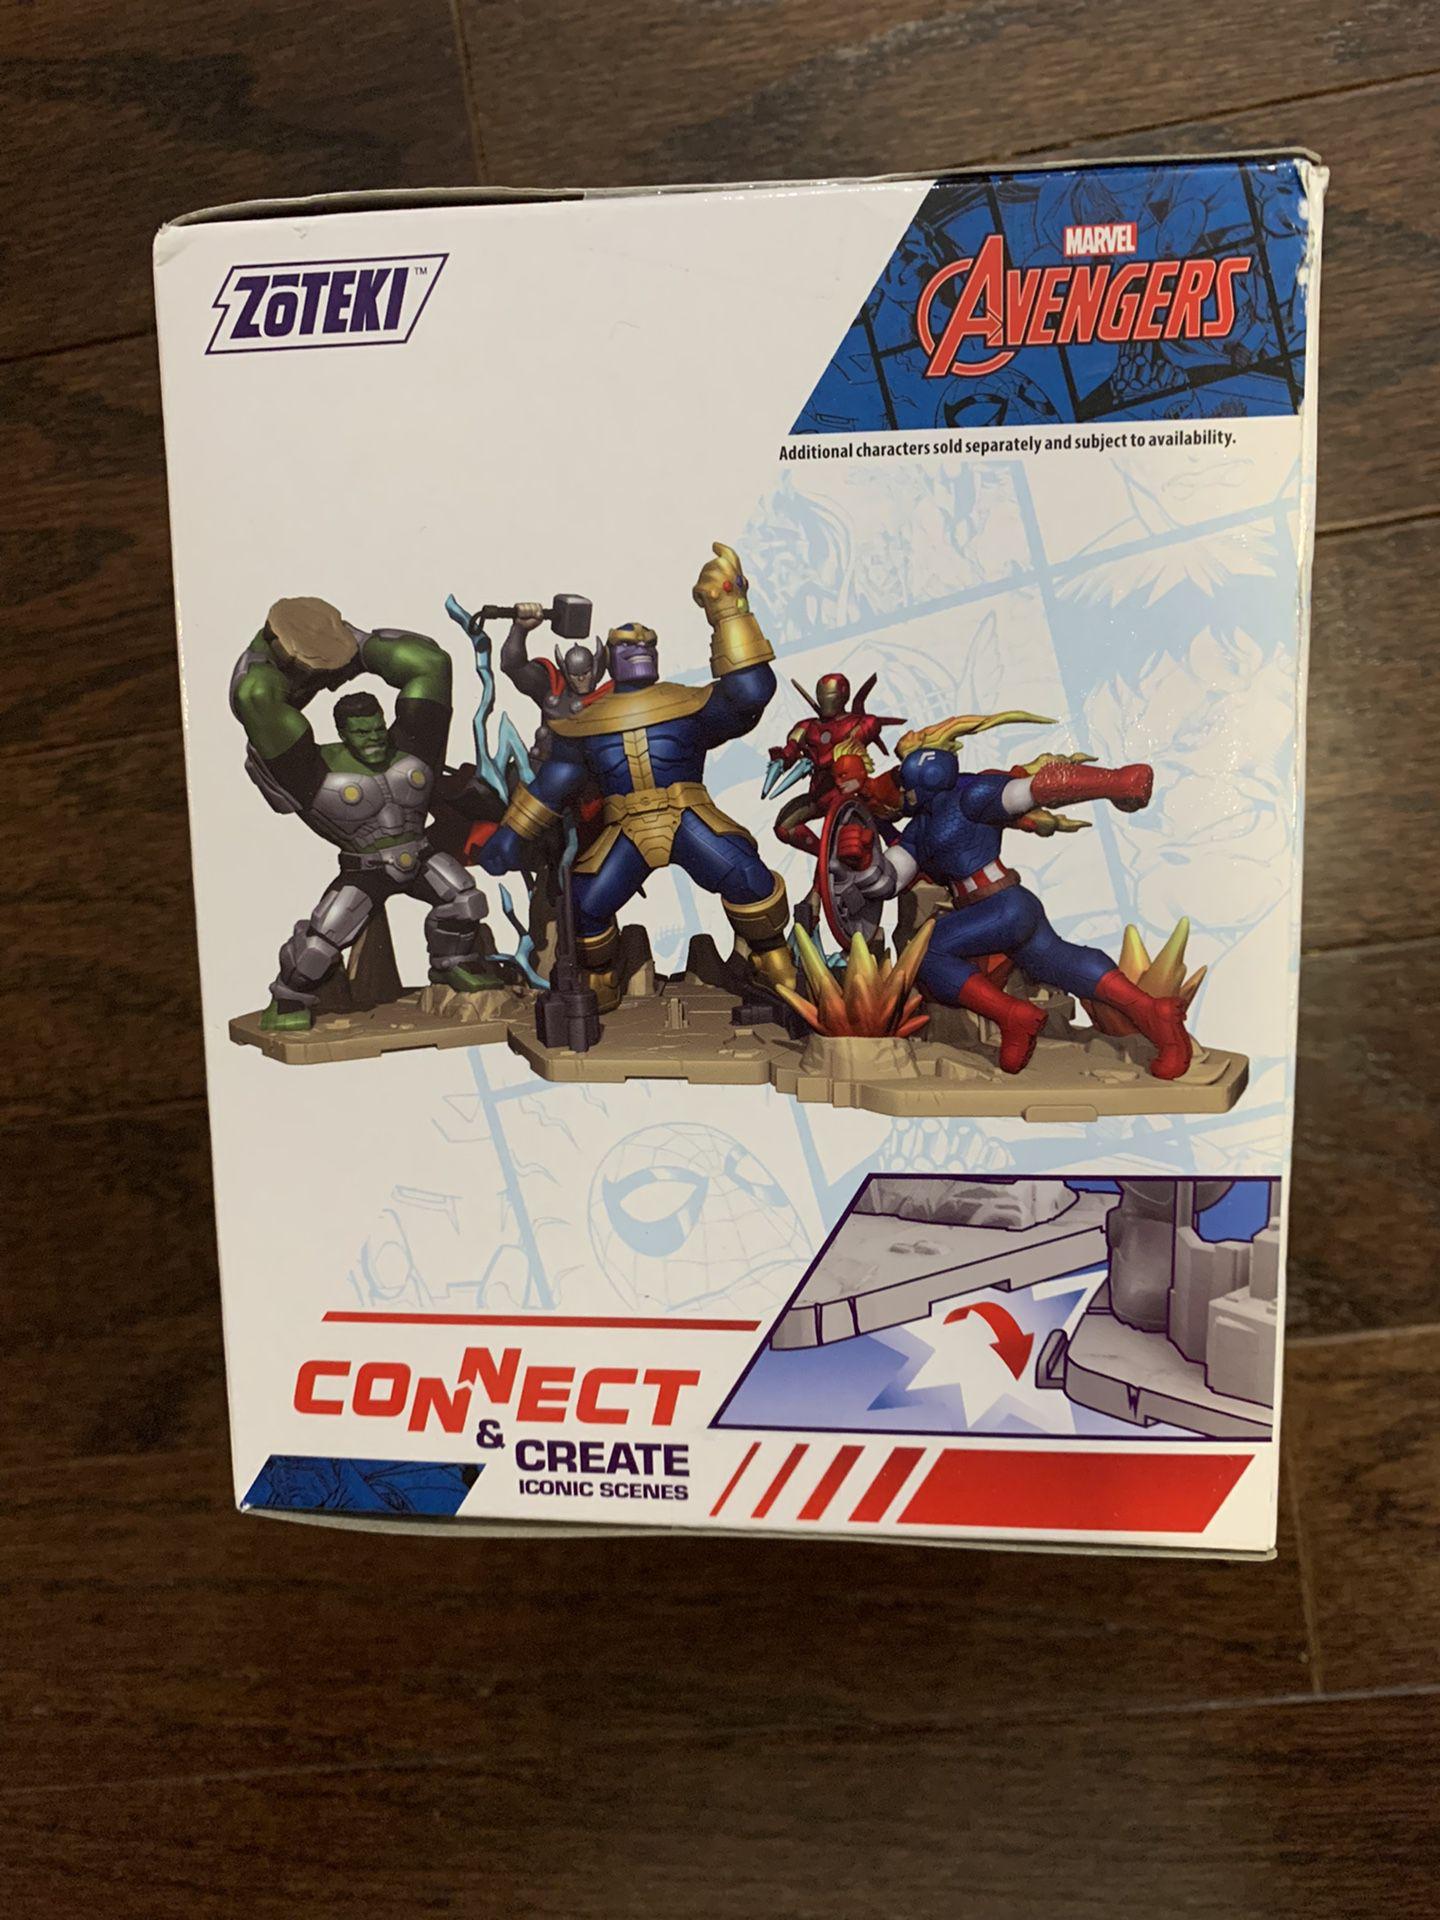 Zoteki Connect & Create Diorama Marvel Avengers CAPTAIN AMERICA NIB MINT RARE!!